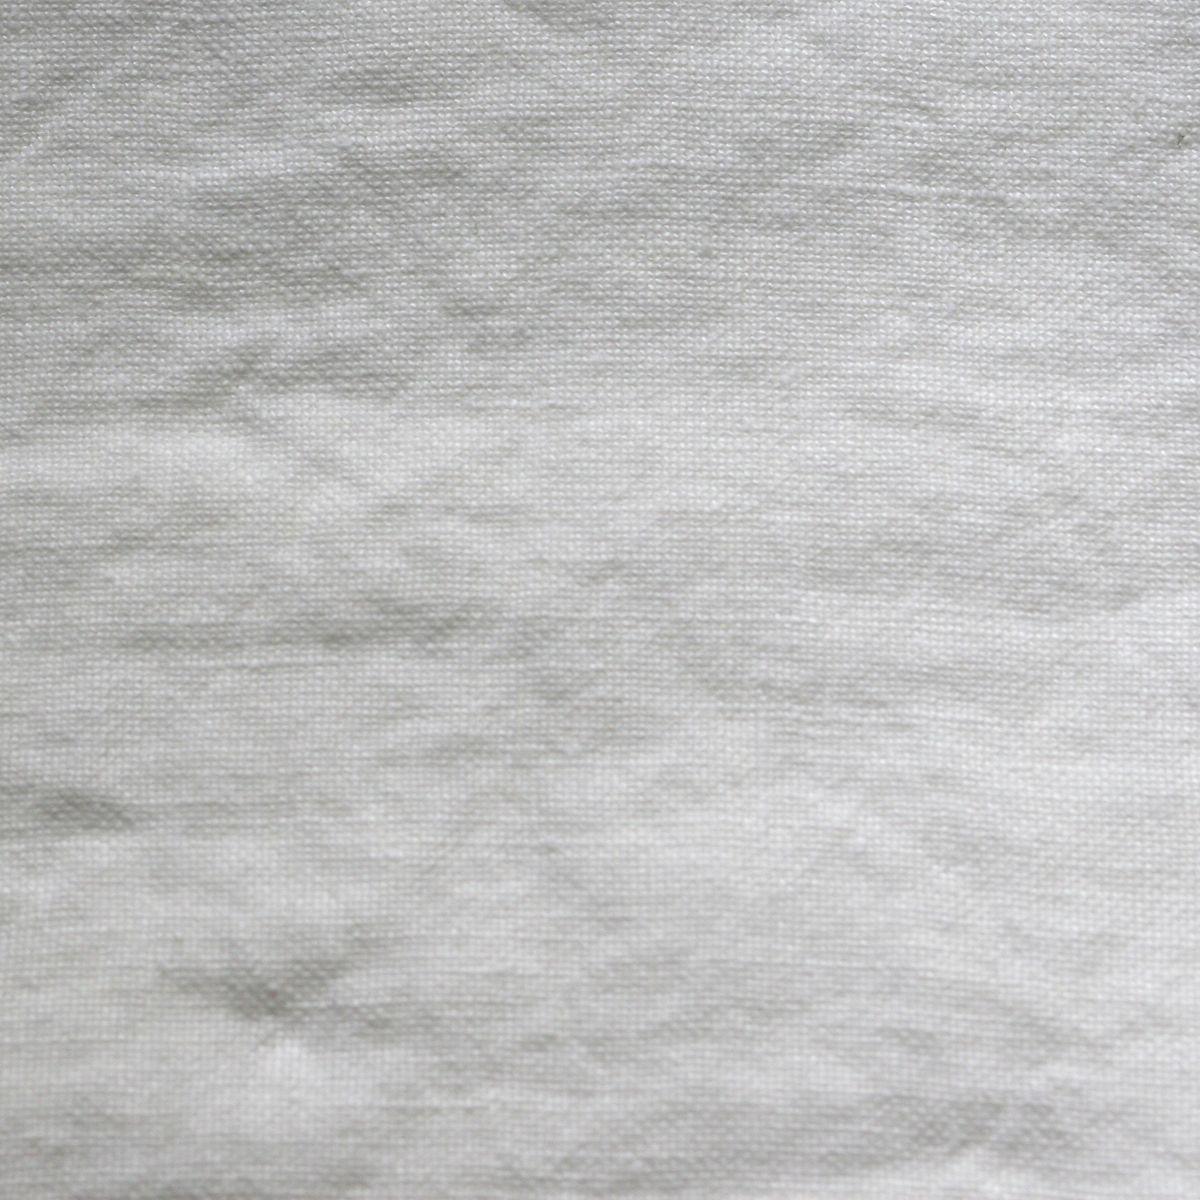 White linen apron - Linen Apron Xs White